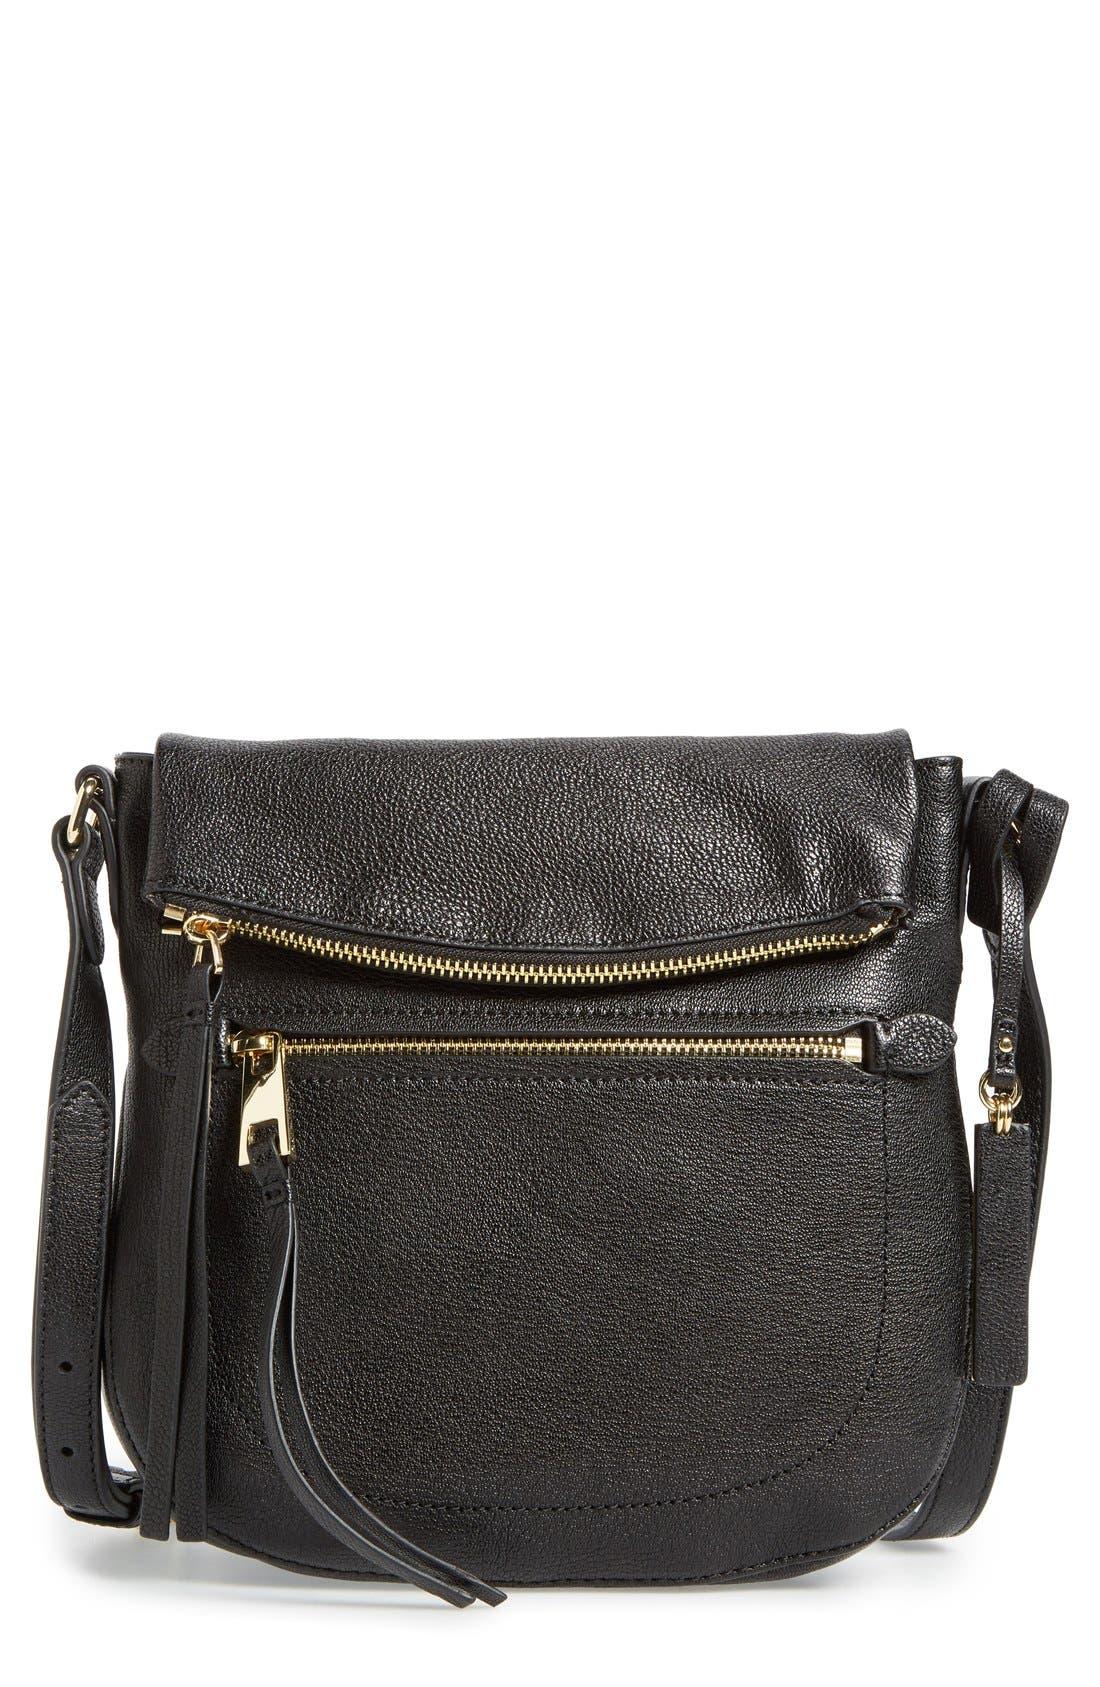 'Tala' Leather Crossbody Bag,                         Main,                         color, 001